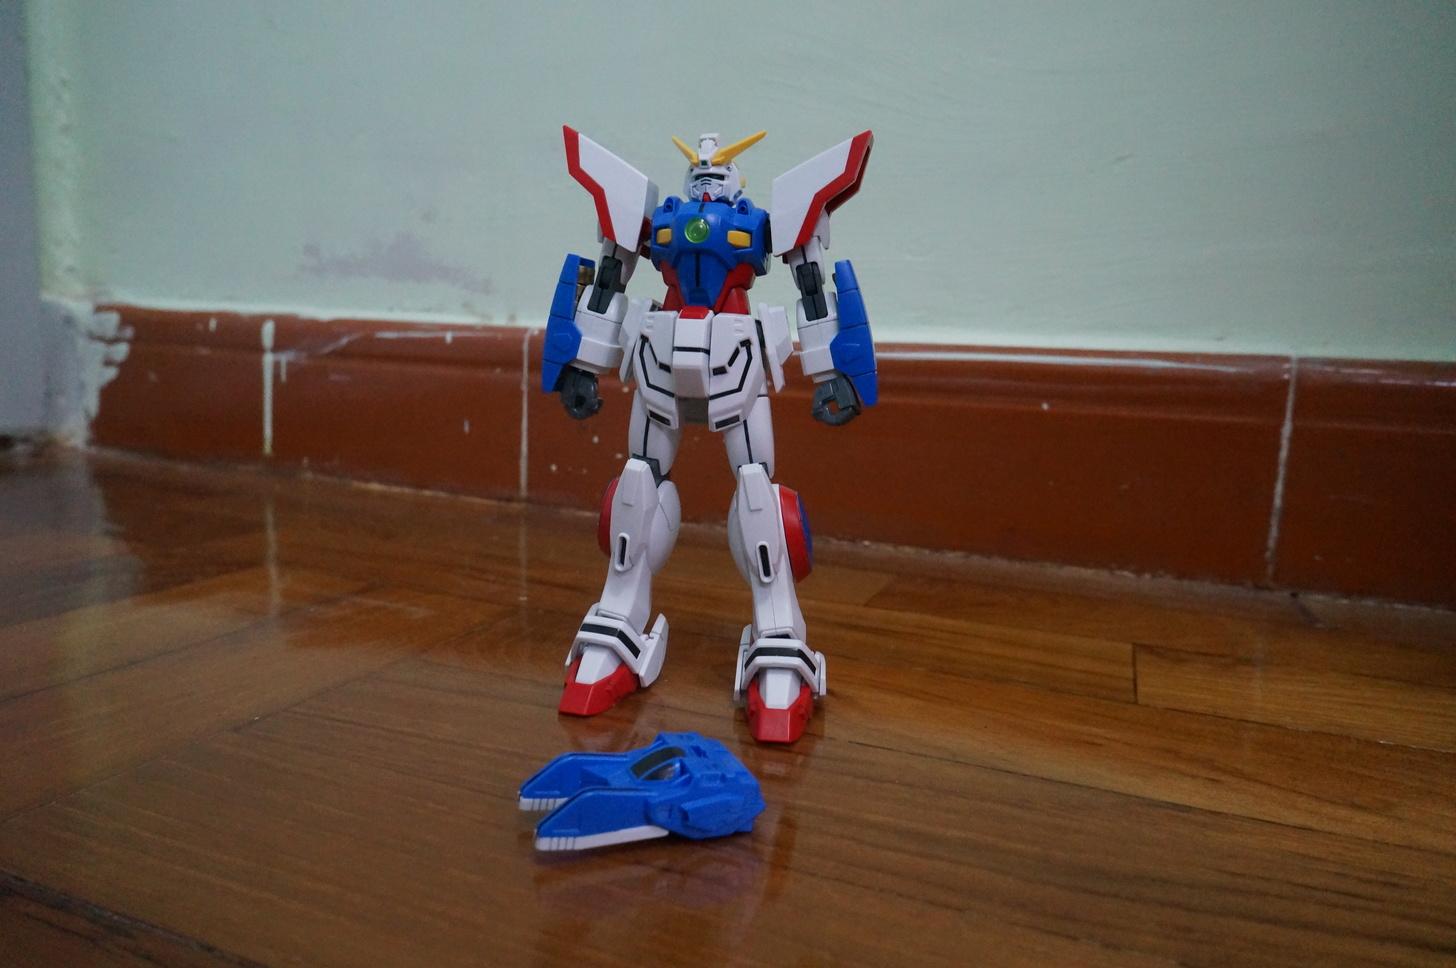 12+ Shining Hand Gundam Image Download 18